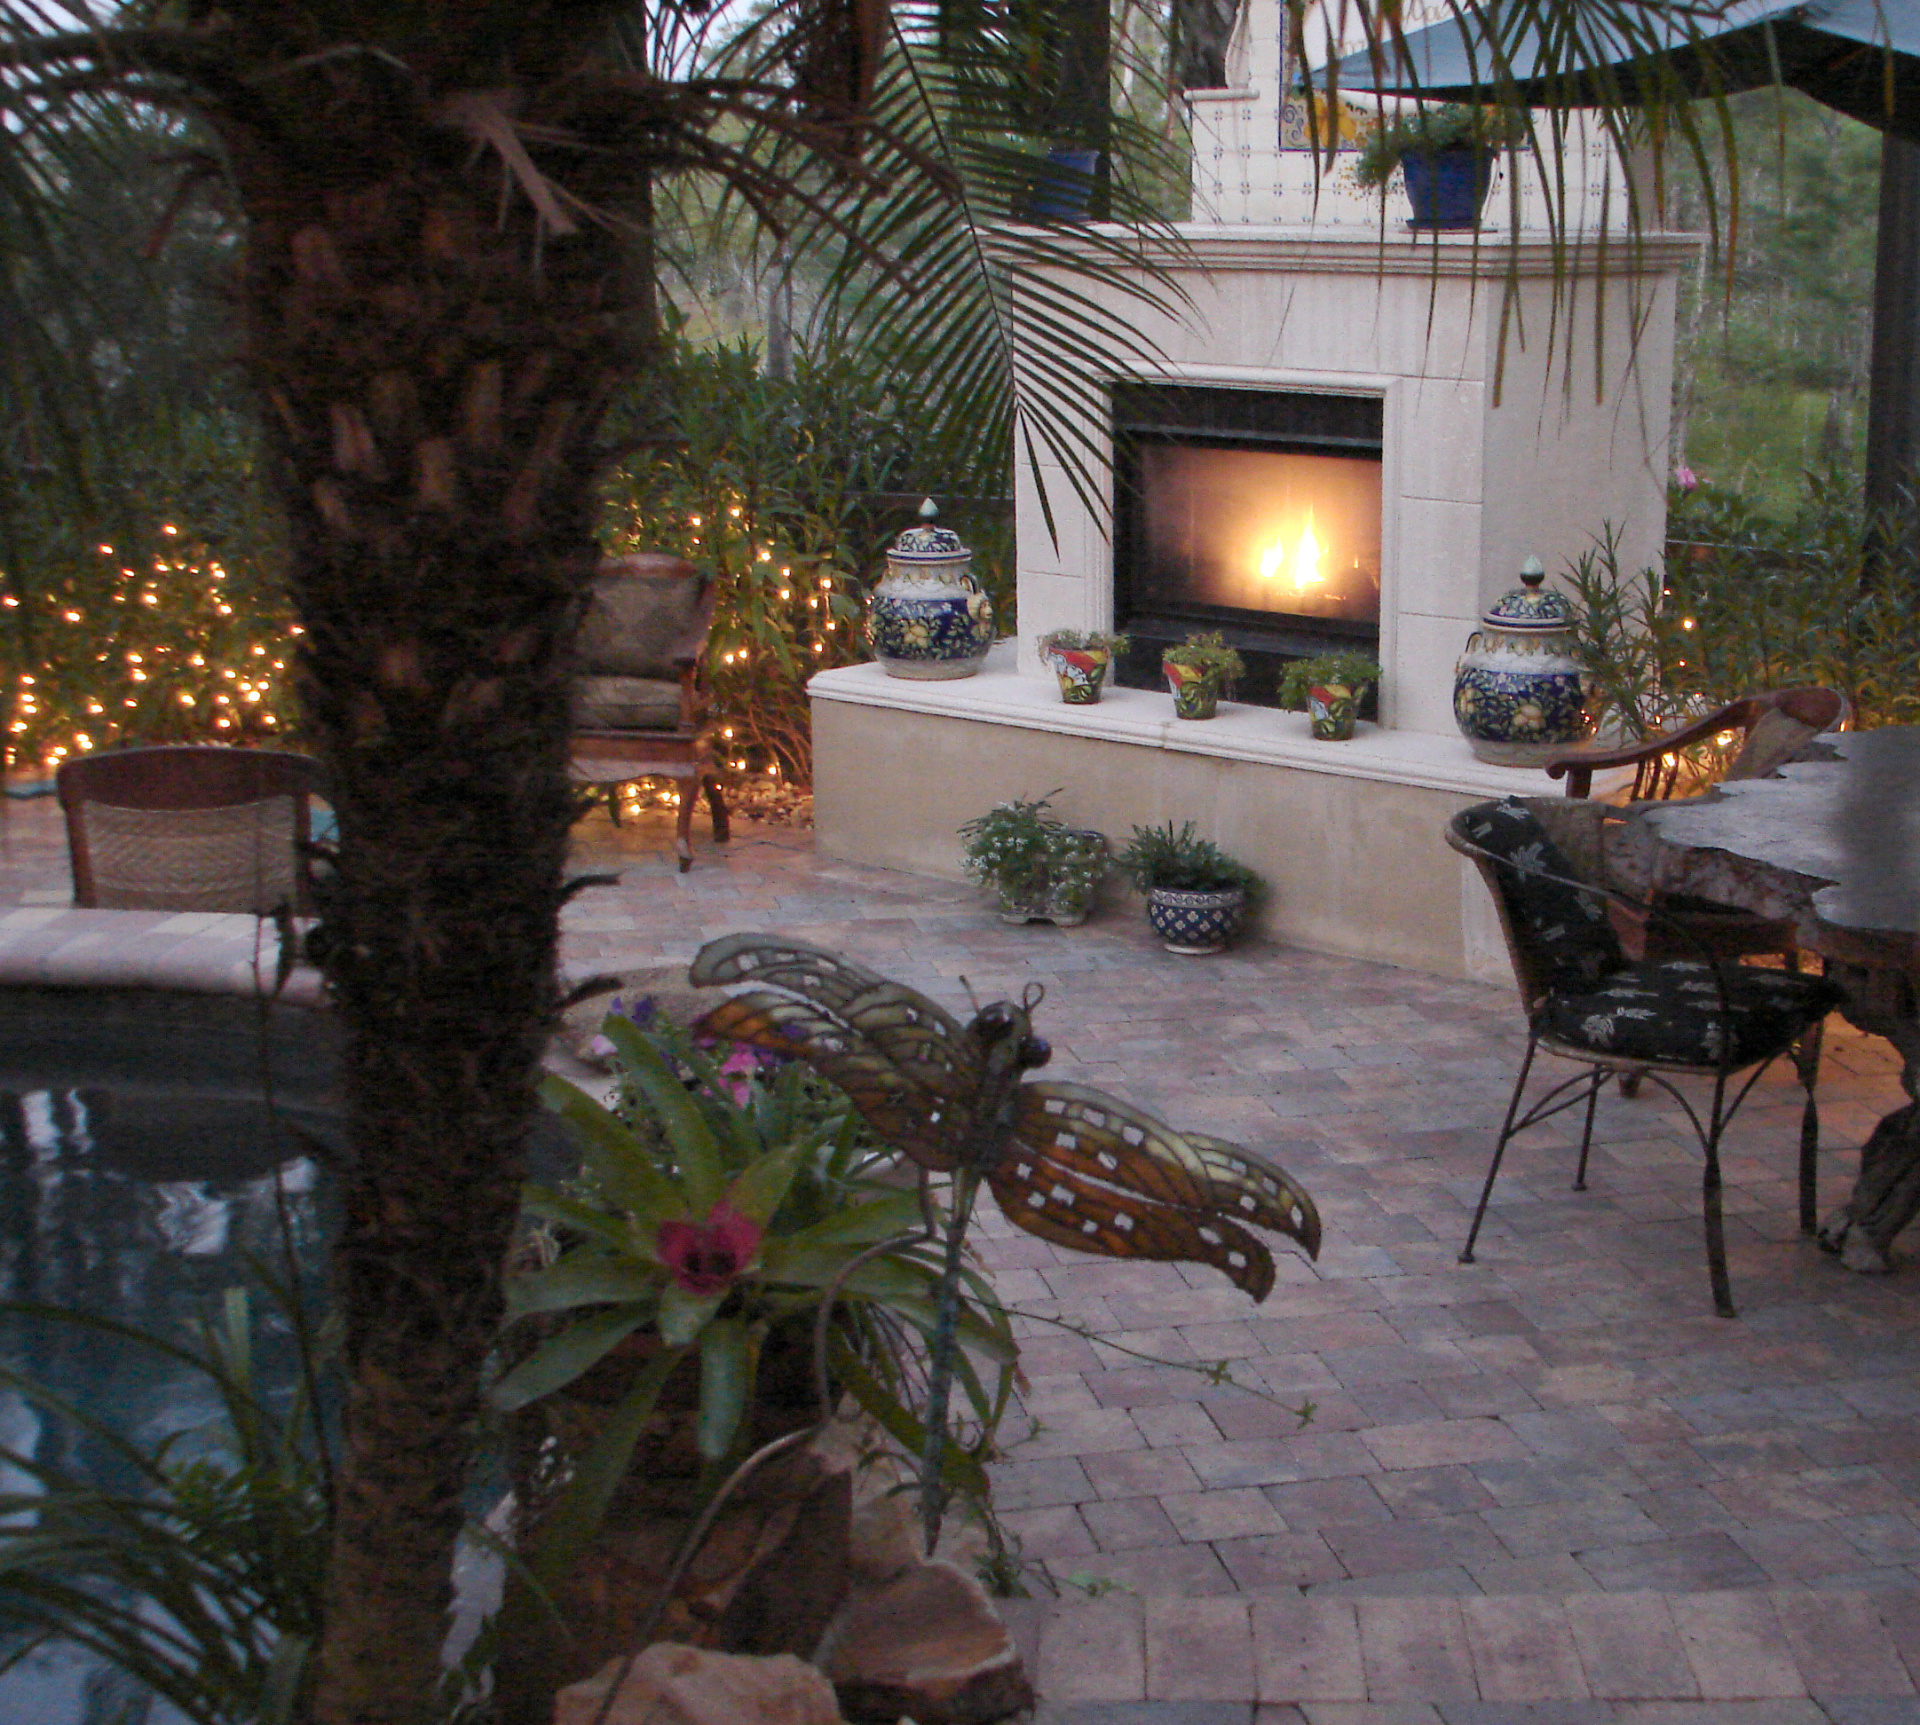 Outdoor Fireplace, Outdoor Living in Orange County